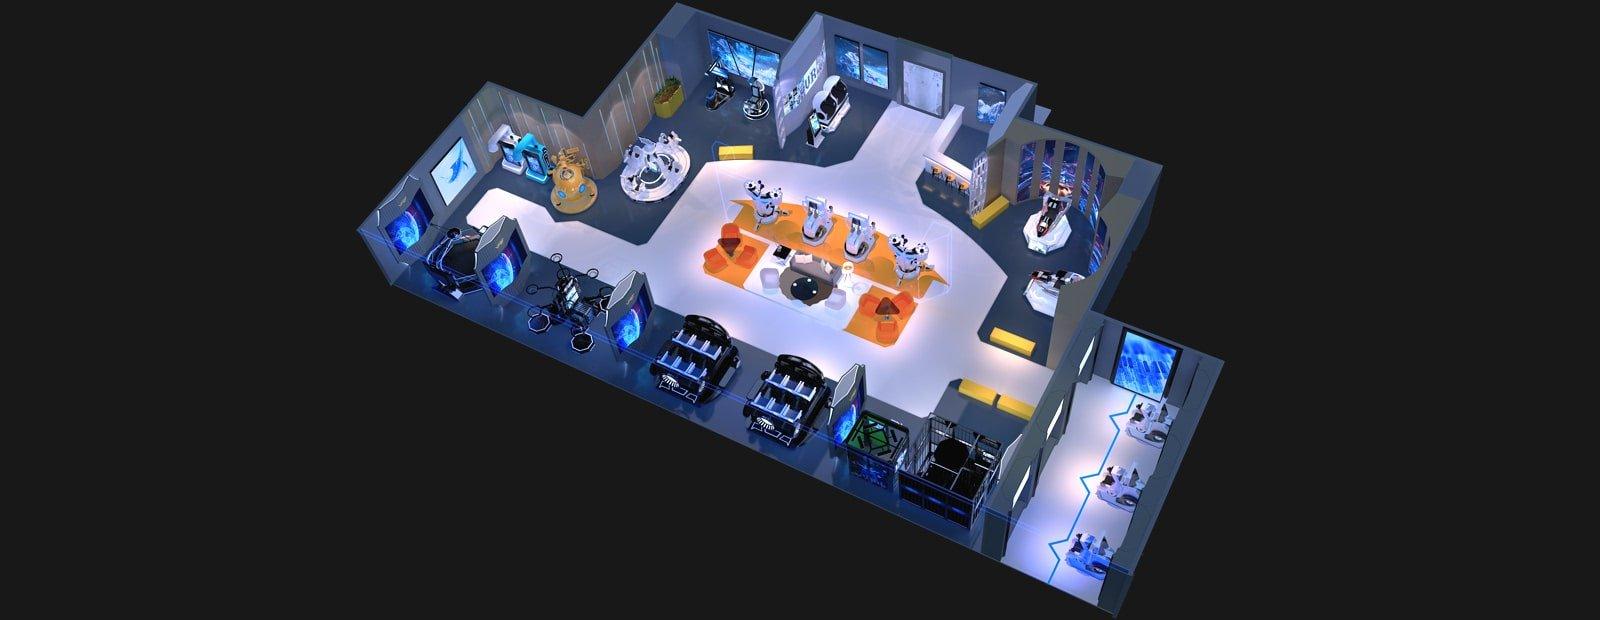 VR Arcade China 500 Square Meter